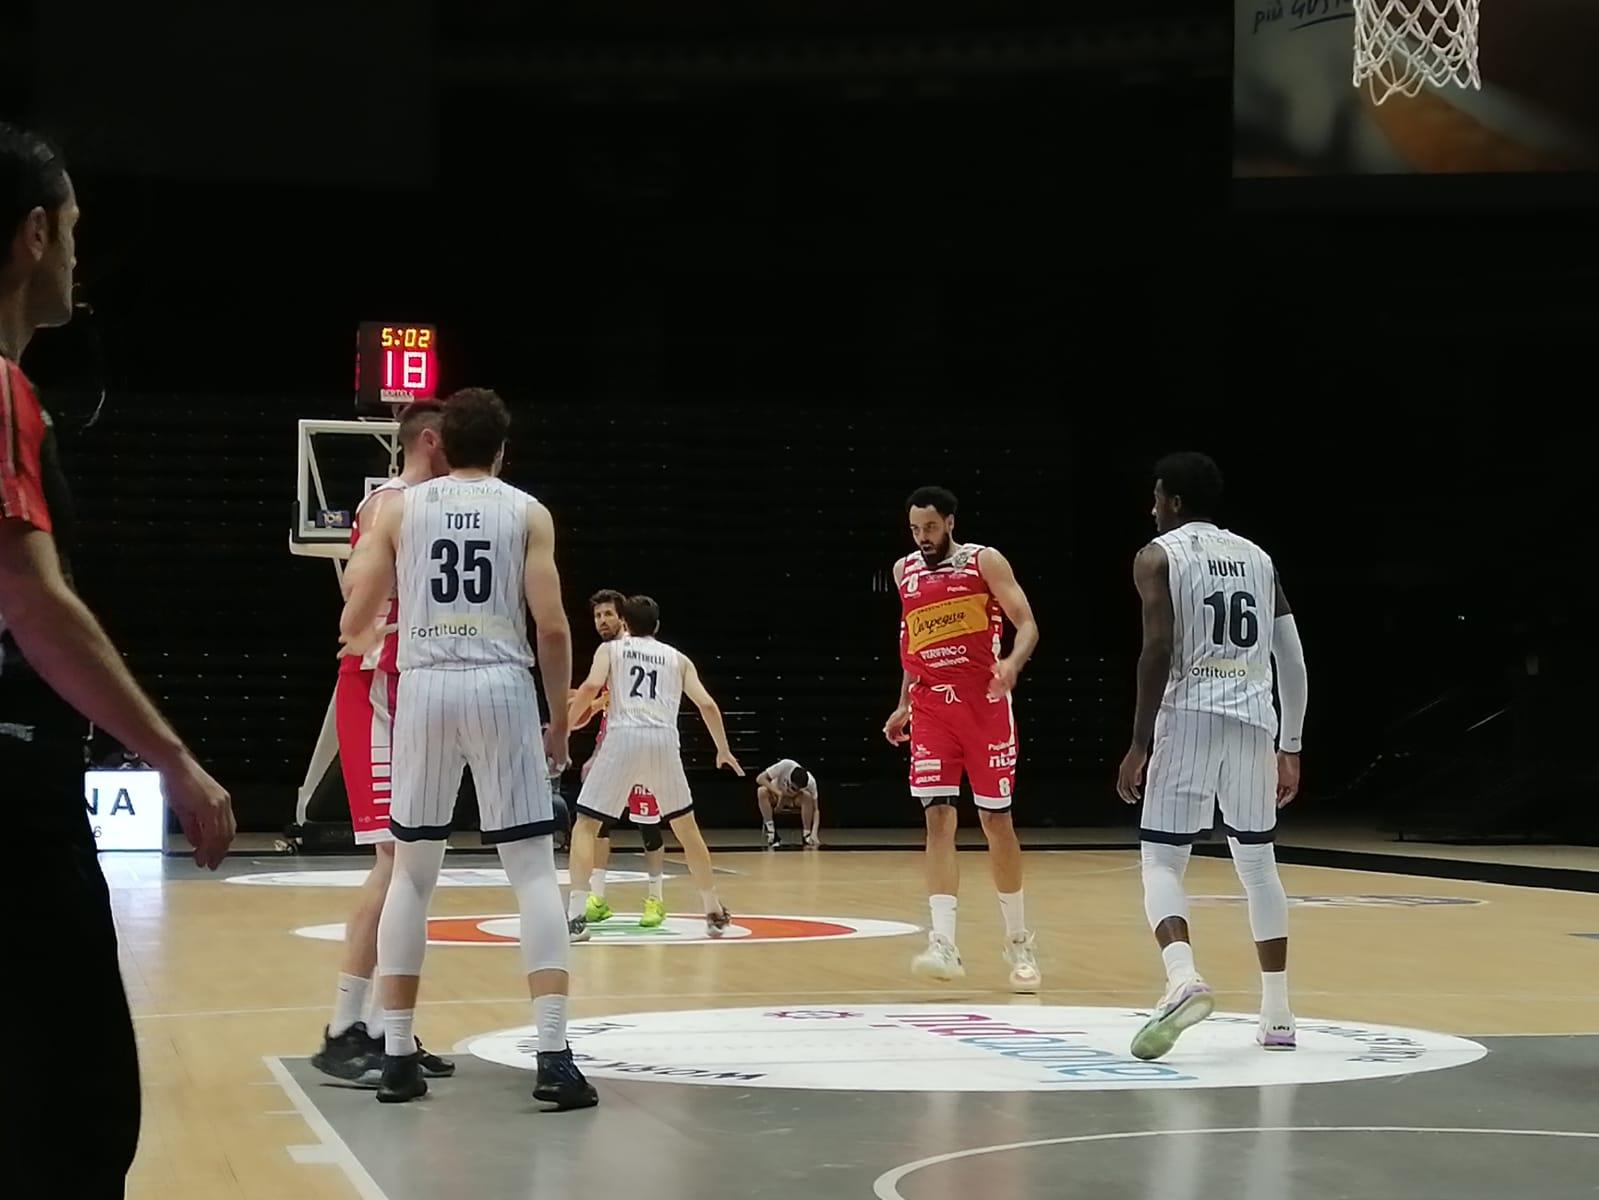 Niente bis per la Fortitudo: Pesaro vince 77-79